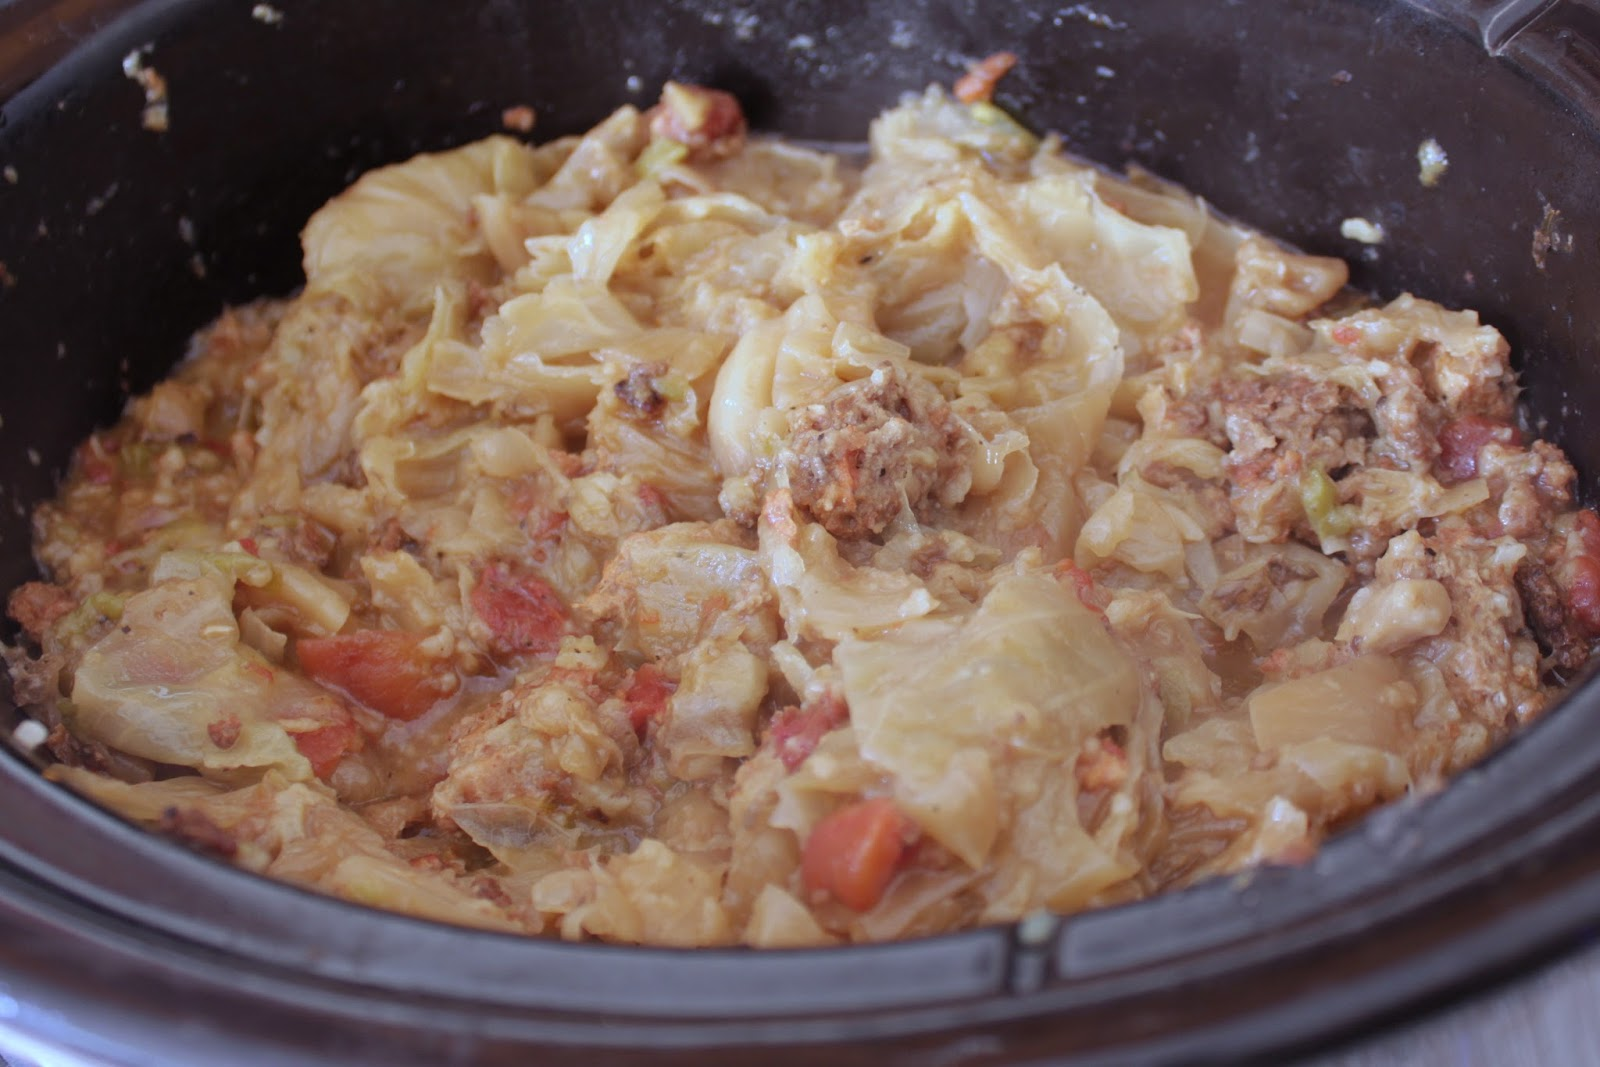 Crockpot deconstructed cabbage rolls